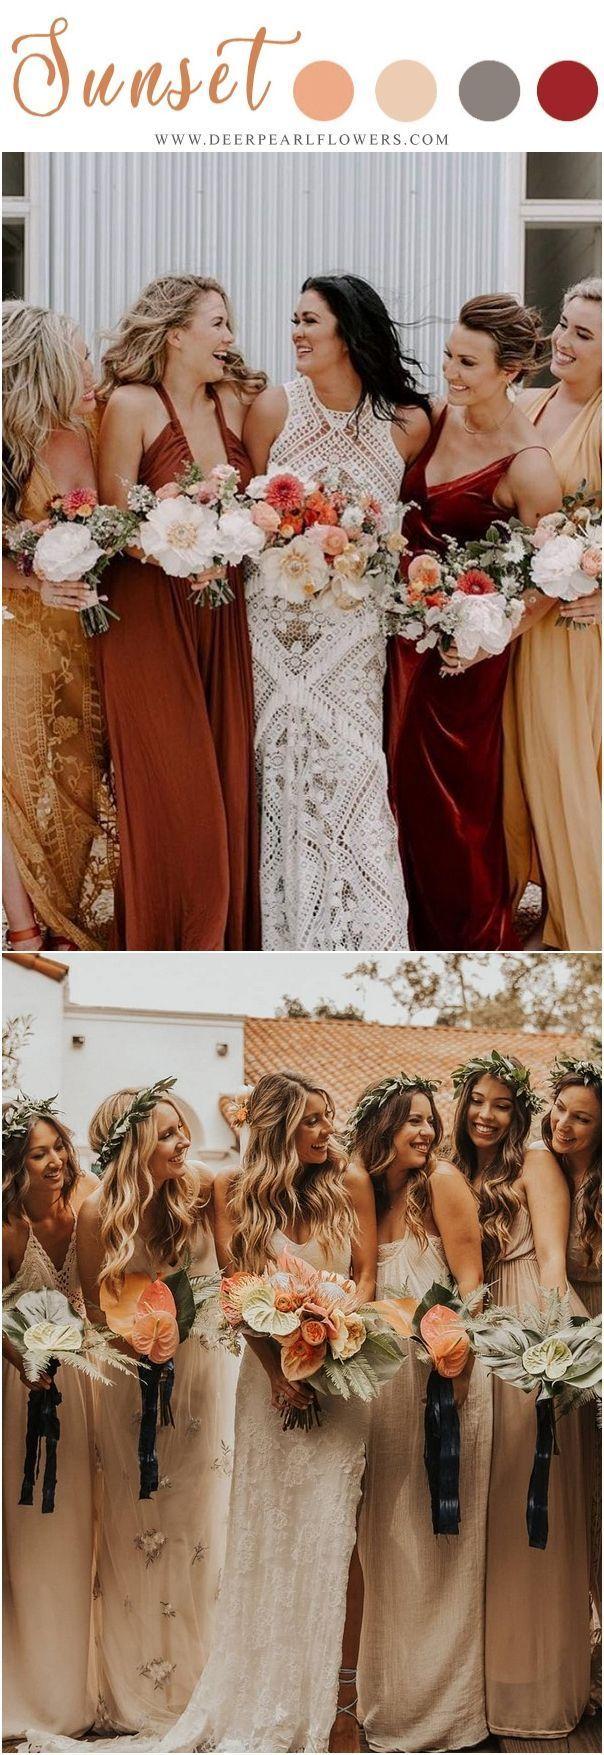 Sunset Orange Fall Wedding Color Ideas Fall Orange Bridesmaid Dresses Weddings Weddin Orange Bridesmaid Dresses Rustic Bridesmaid Dresses Bridesmaid Colors [ 1755 x 604 Pixel ]